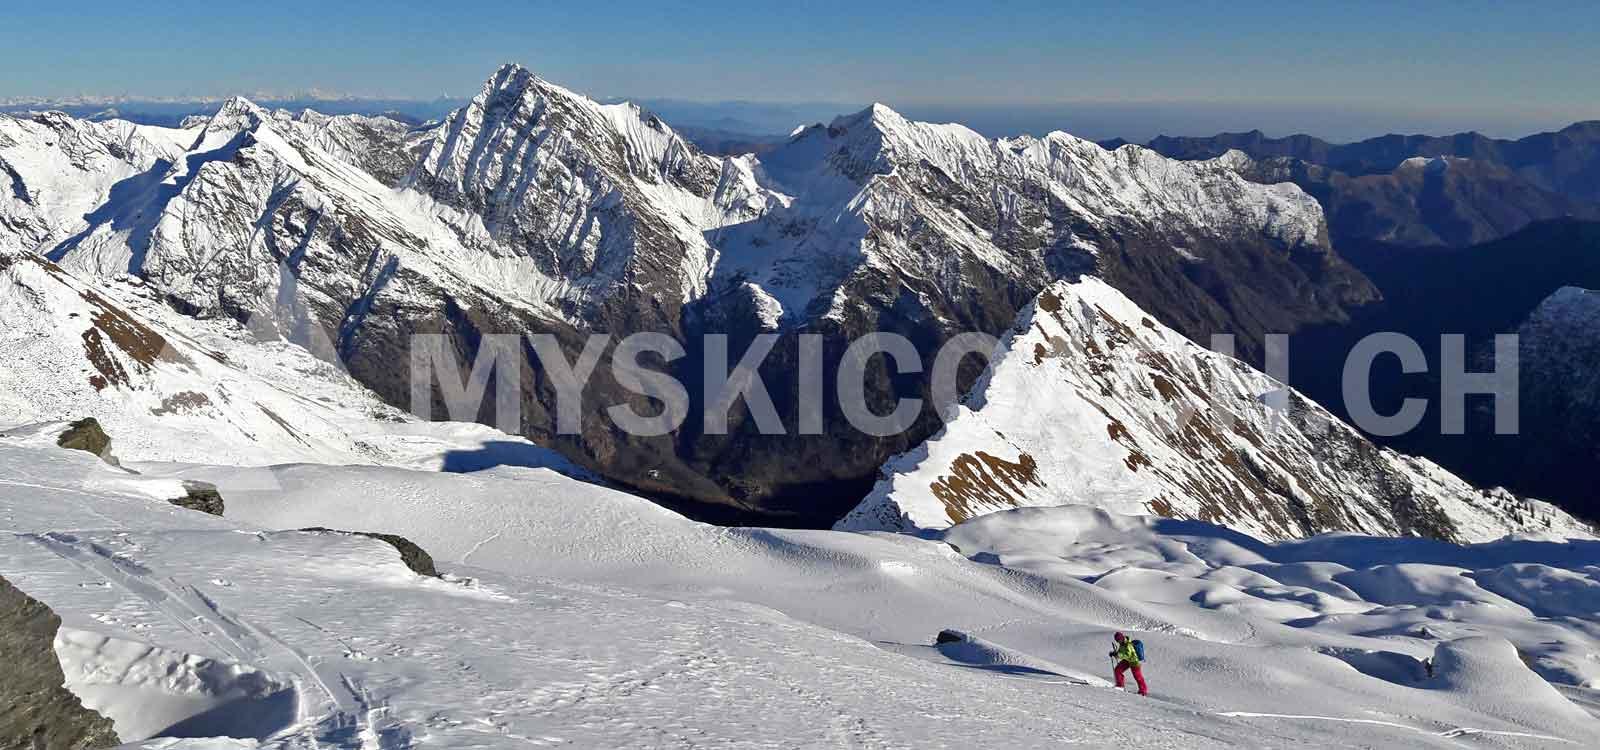 Freeride Monte Rosa - Gressoney - Alagna - Champoluc ¦ MySkiCoach.ch